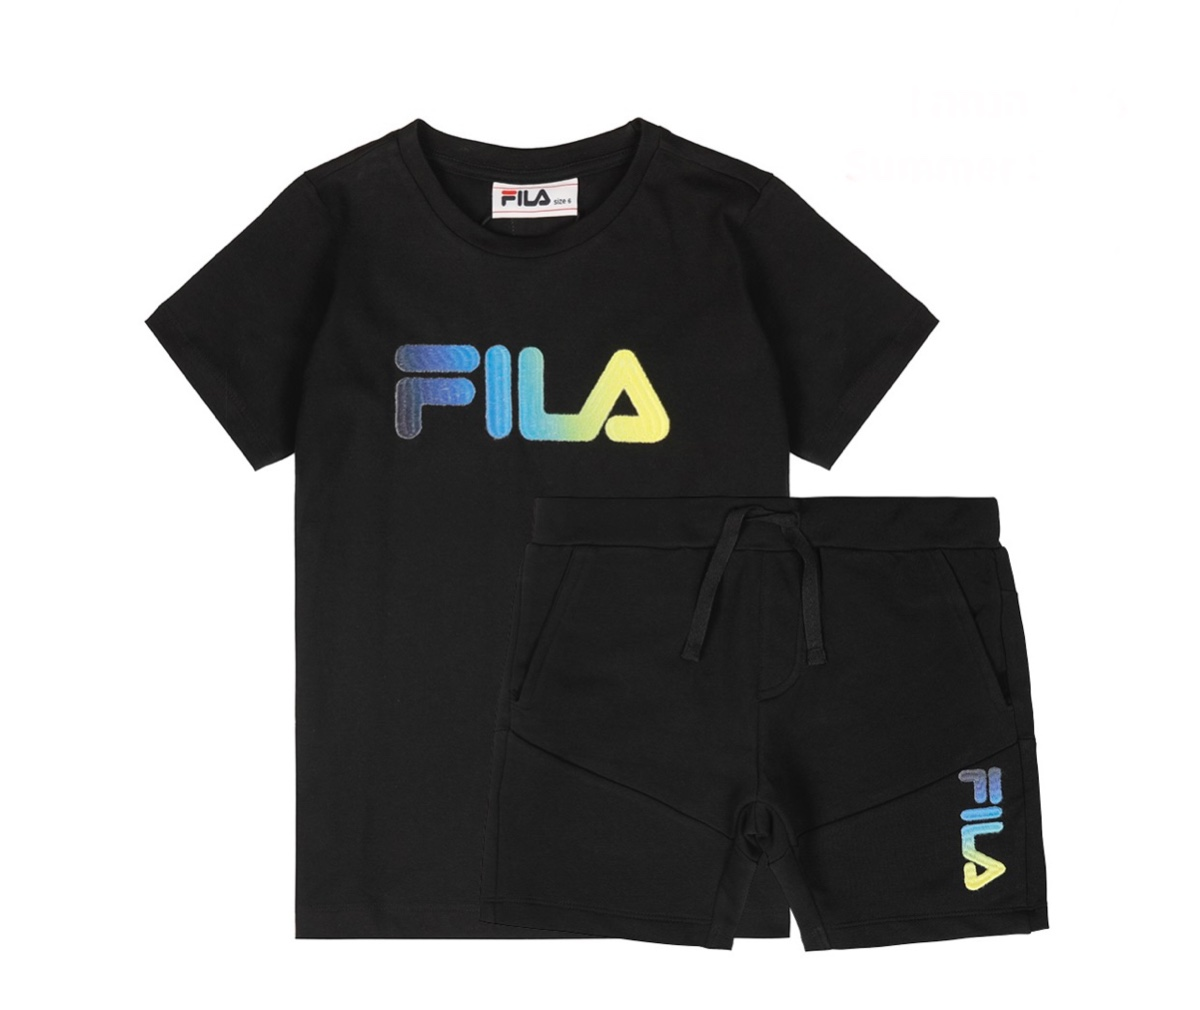 Fila חליפה שחורה לוגו צבעוני מידות 2-16